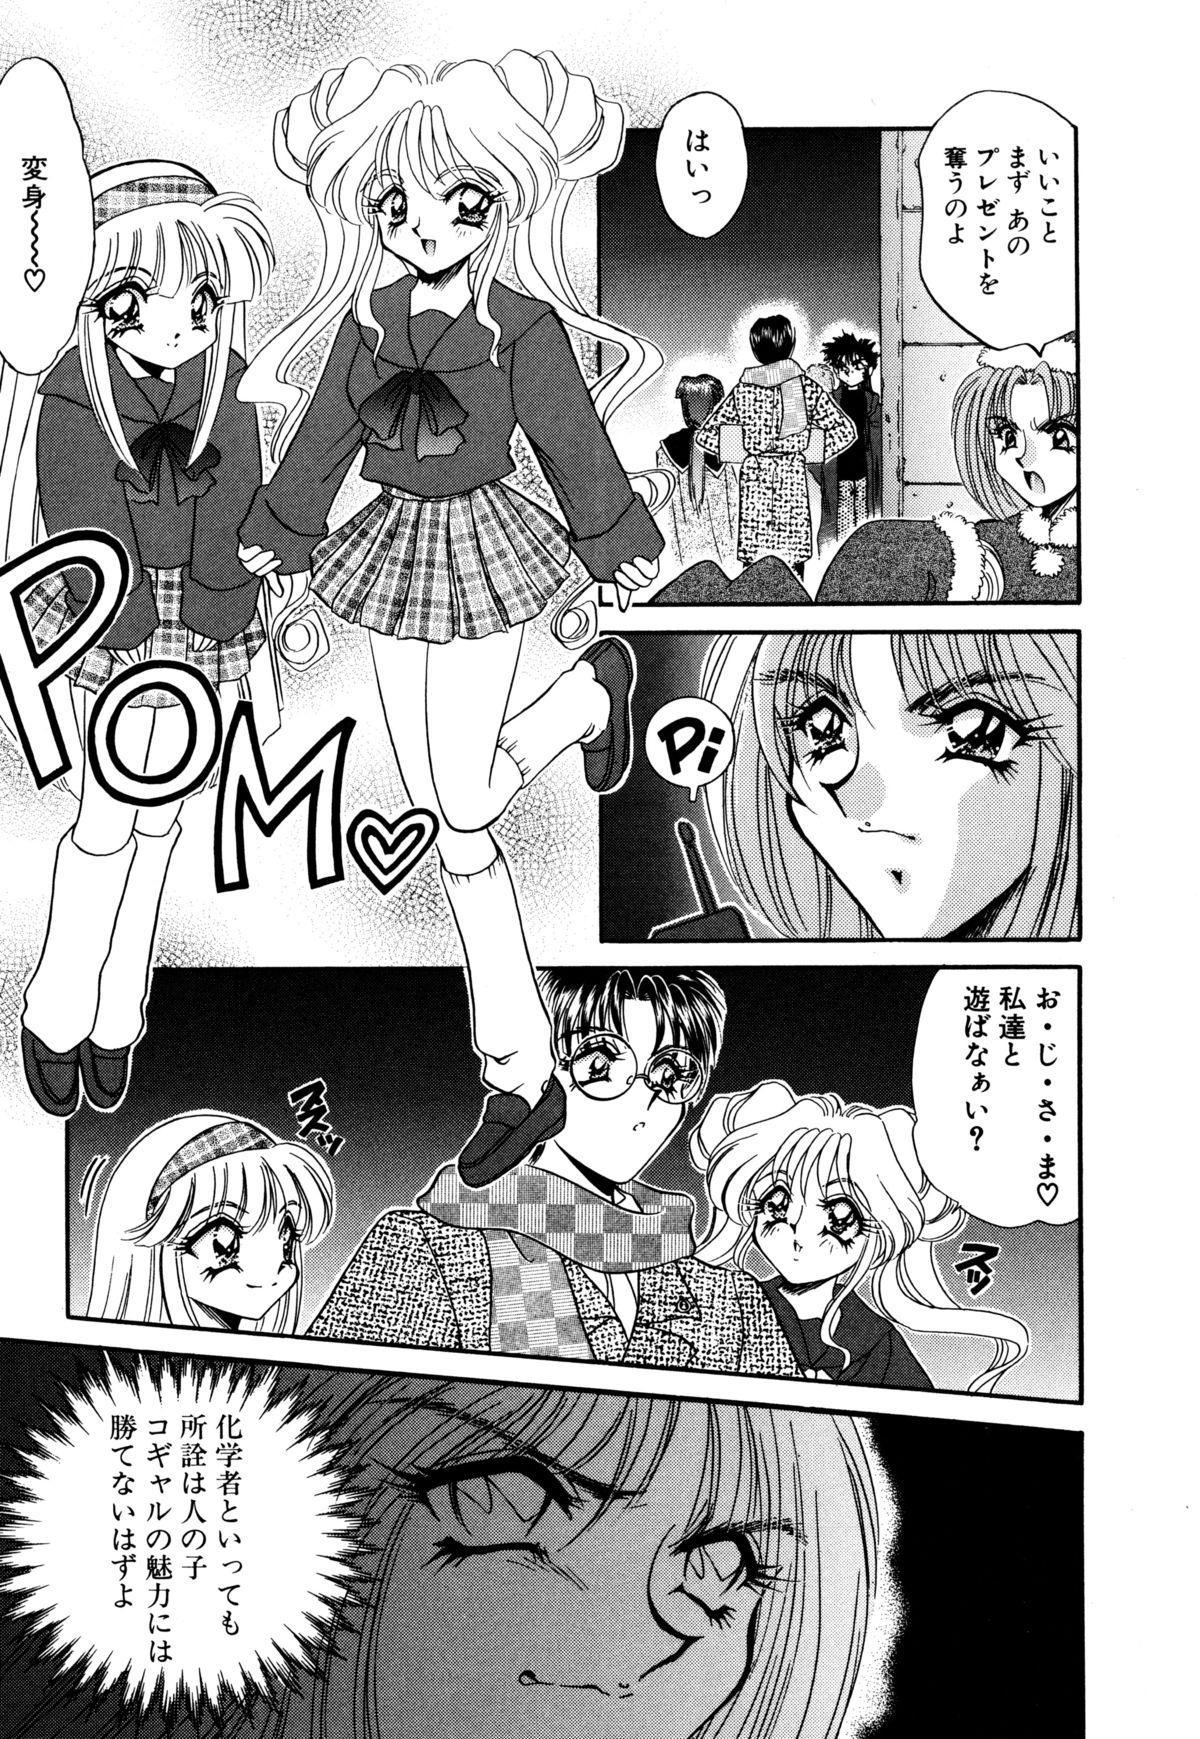 Kigurumi Sentai Quiltian 95